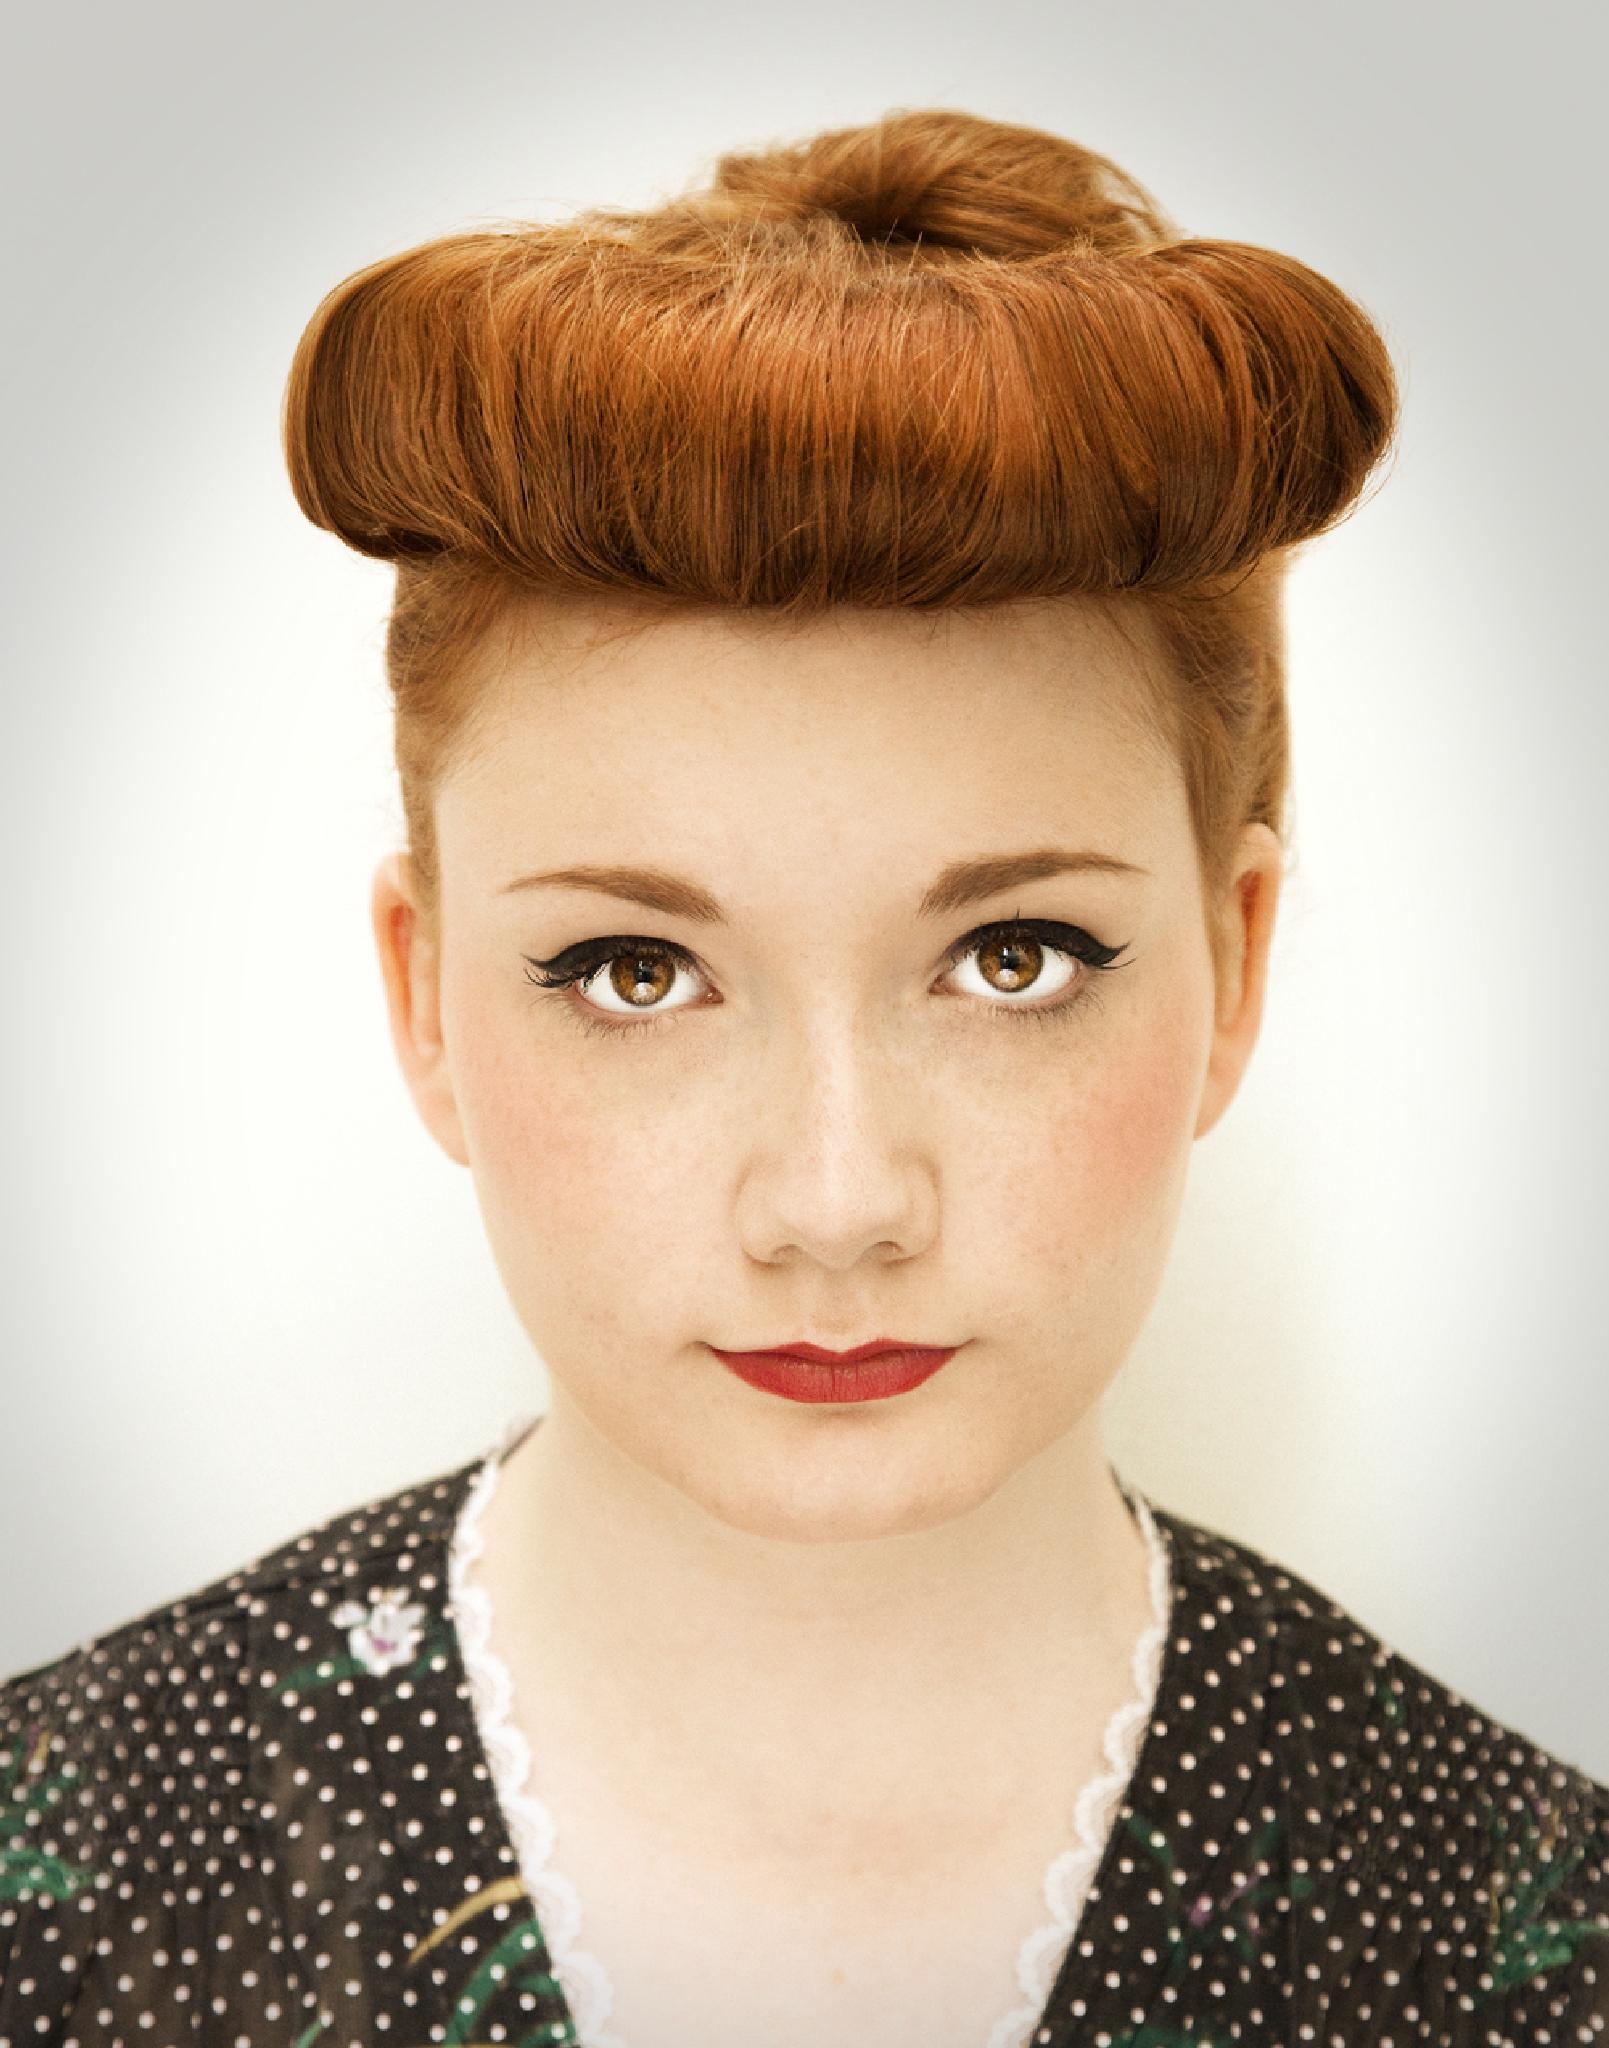 VINTAGE HAIR by AlisonWallisPhotography